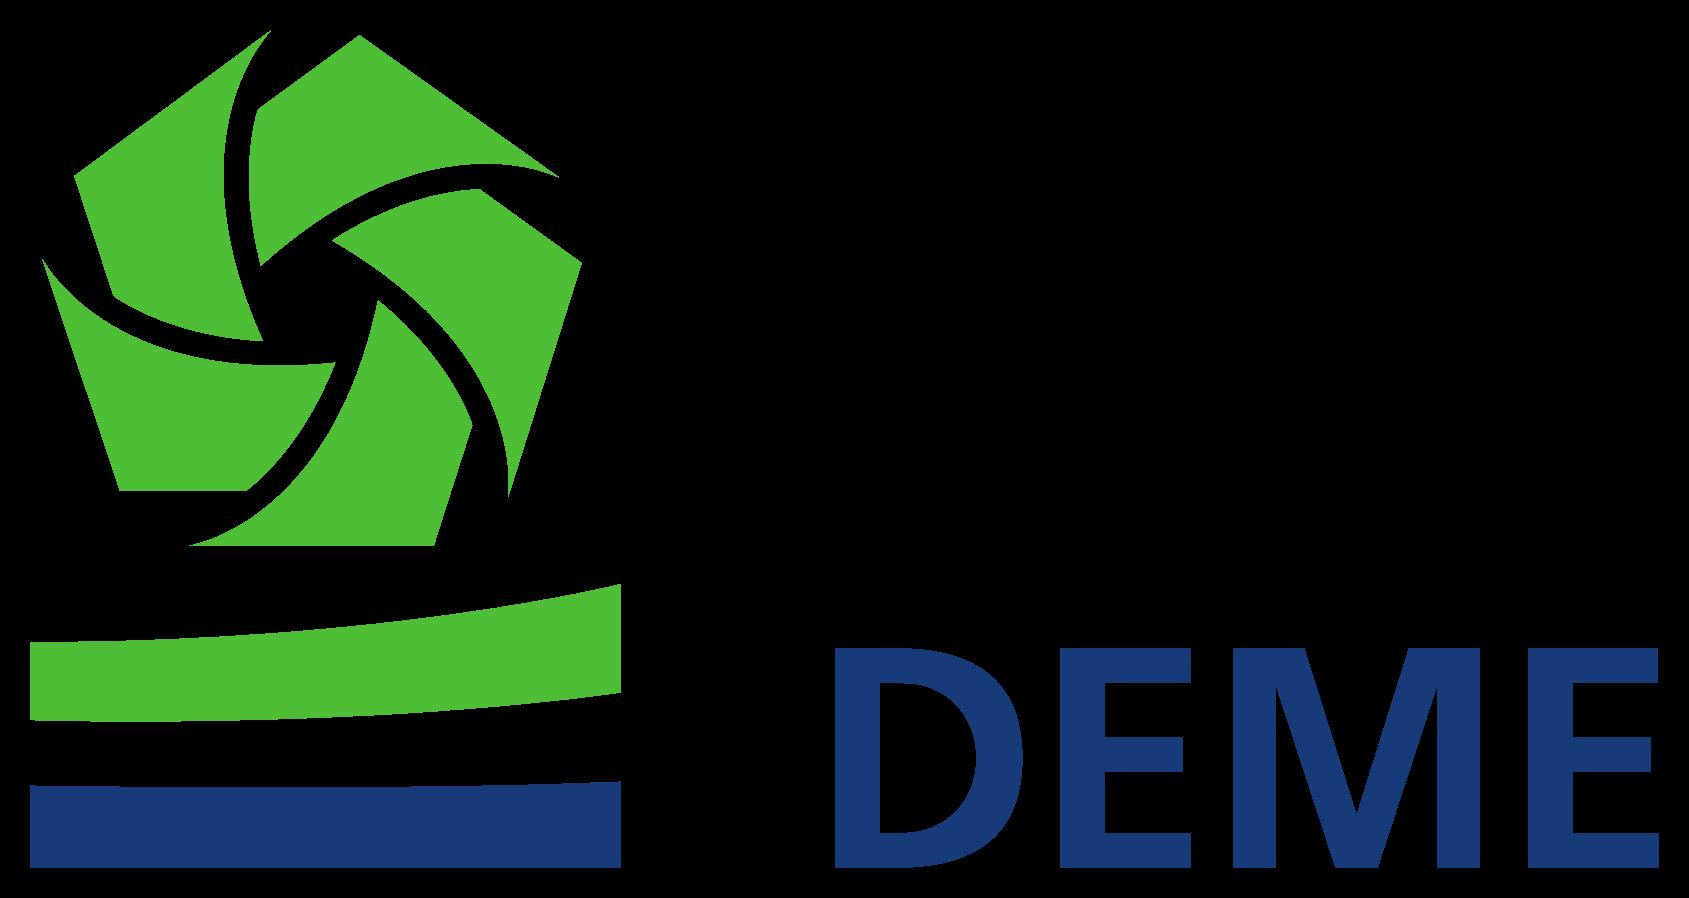 deme-logo.png